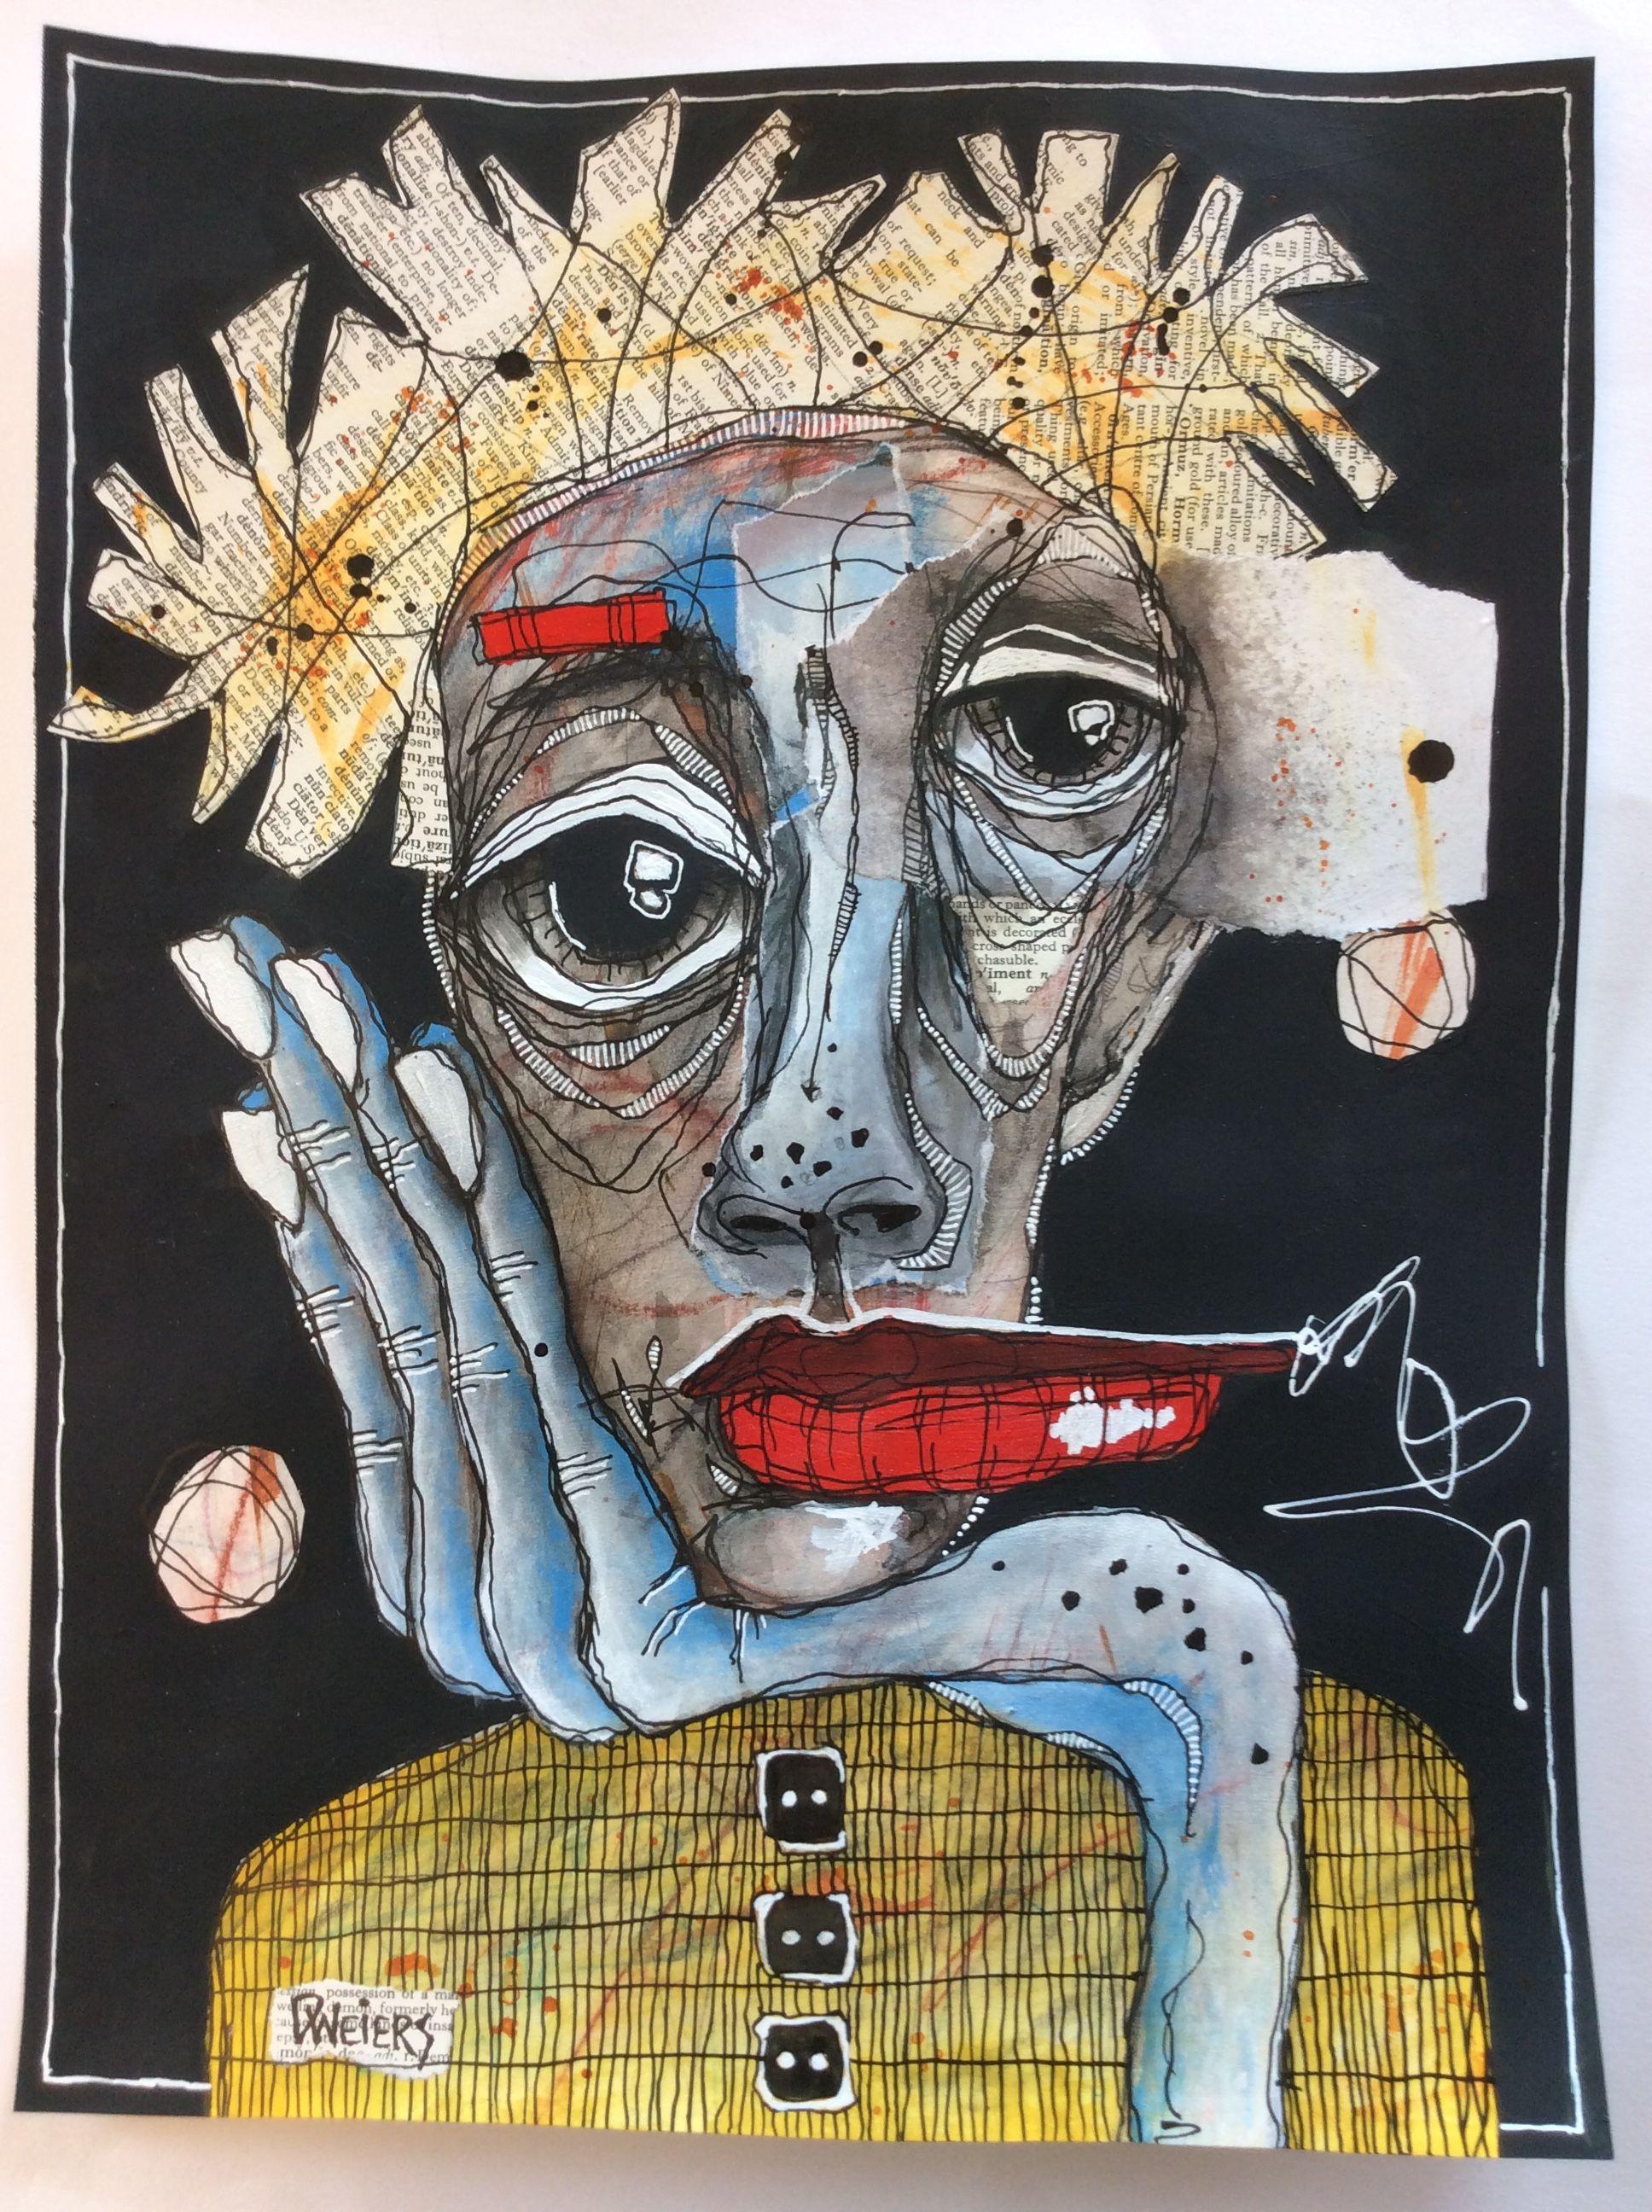 Deb Weiers The Blue Hand 10x14 In 2019 Art Art